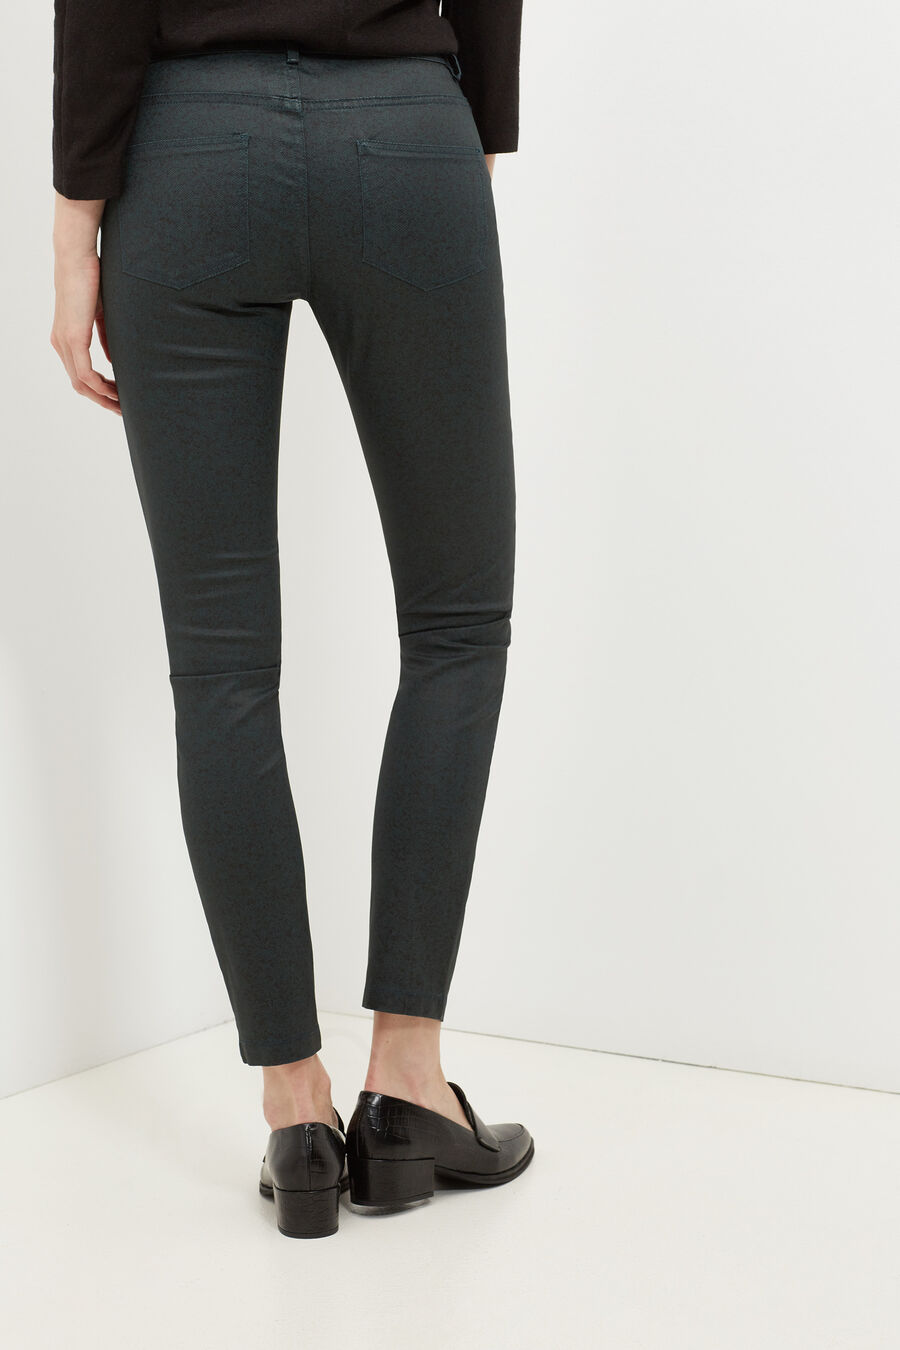 Skinny waxed trousers